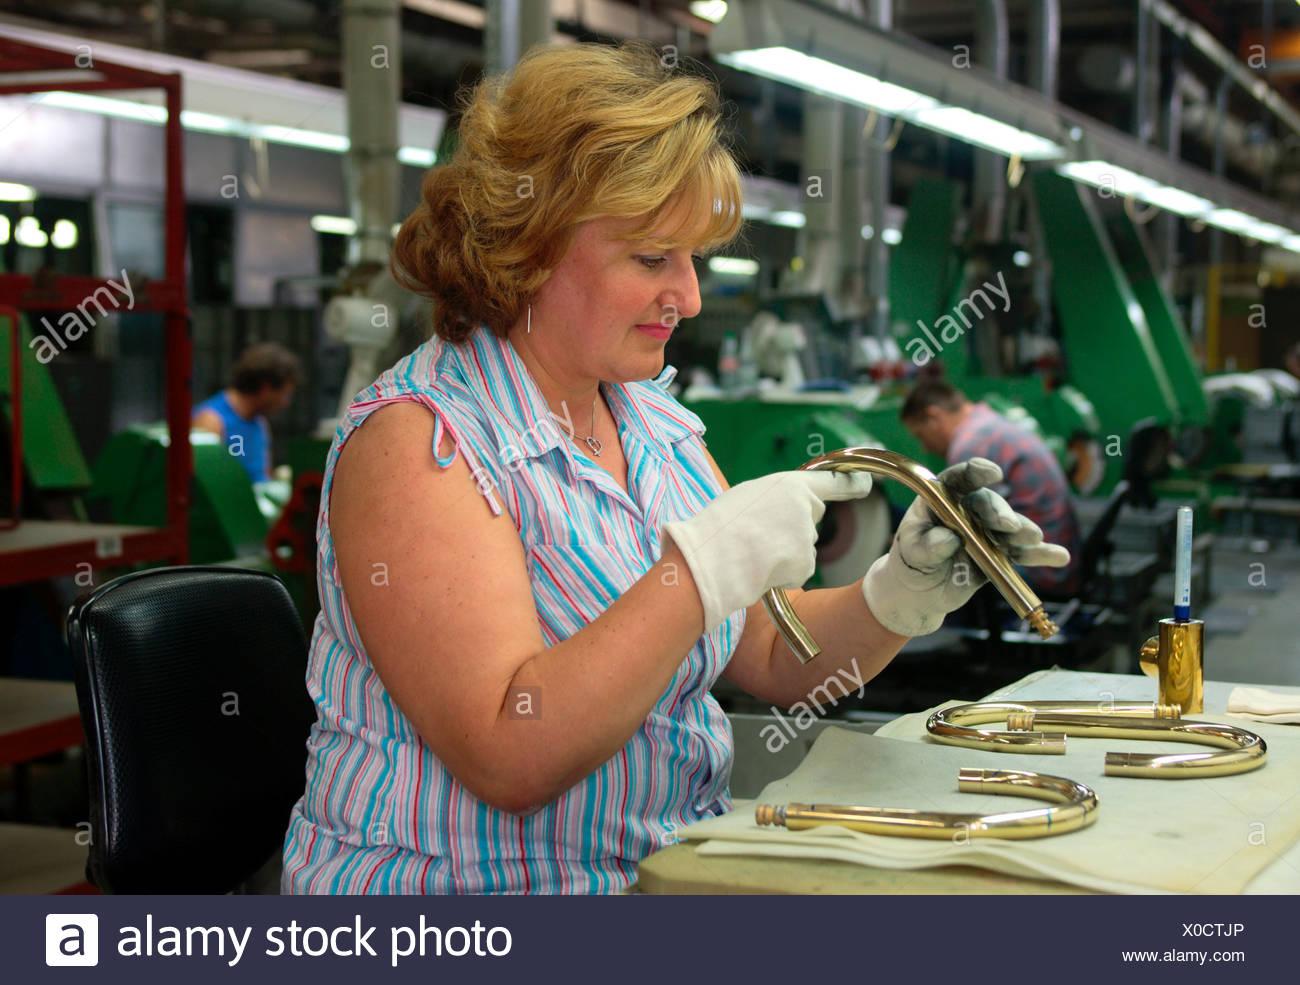 Armaturenhersteller Dornbracht In Iserlohn Stockfoto Bild